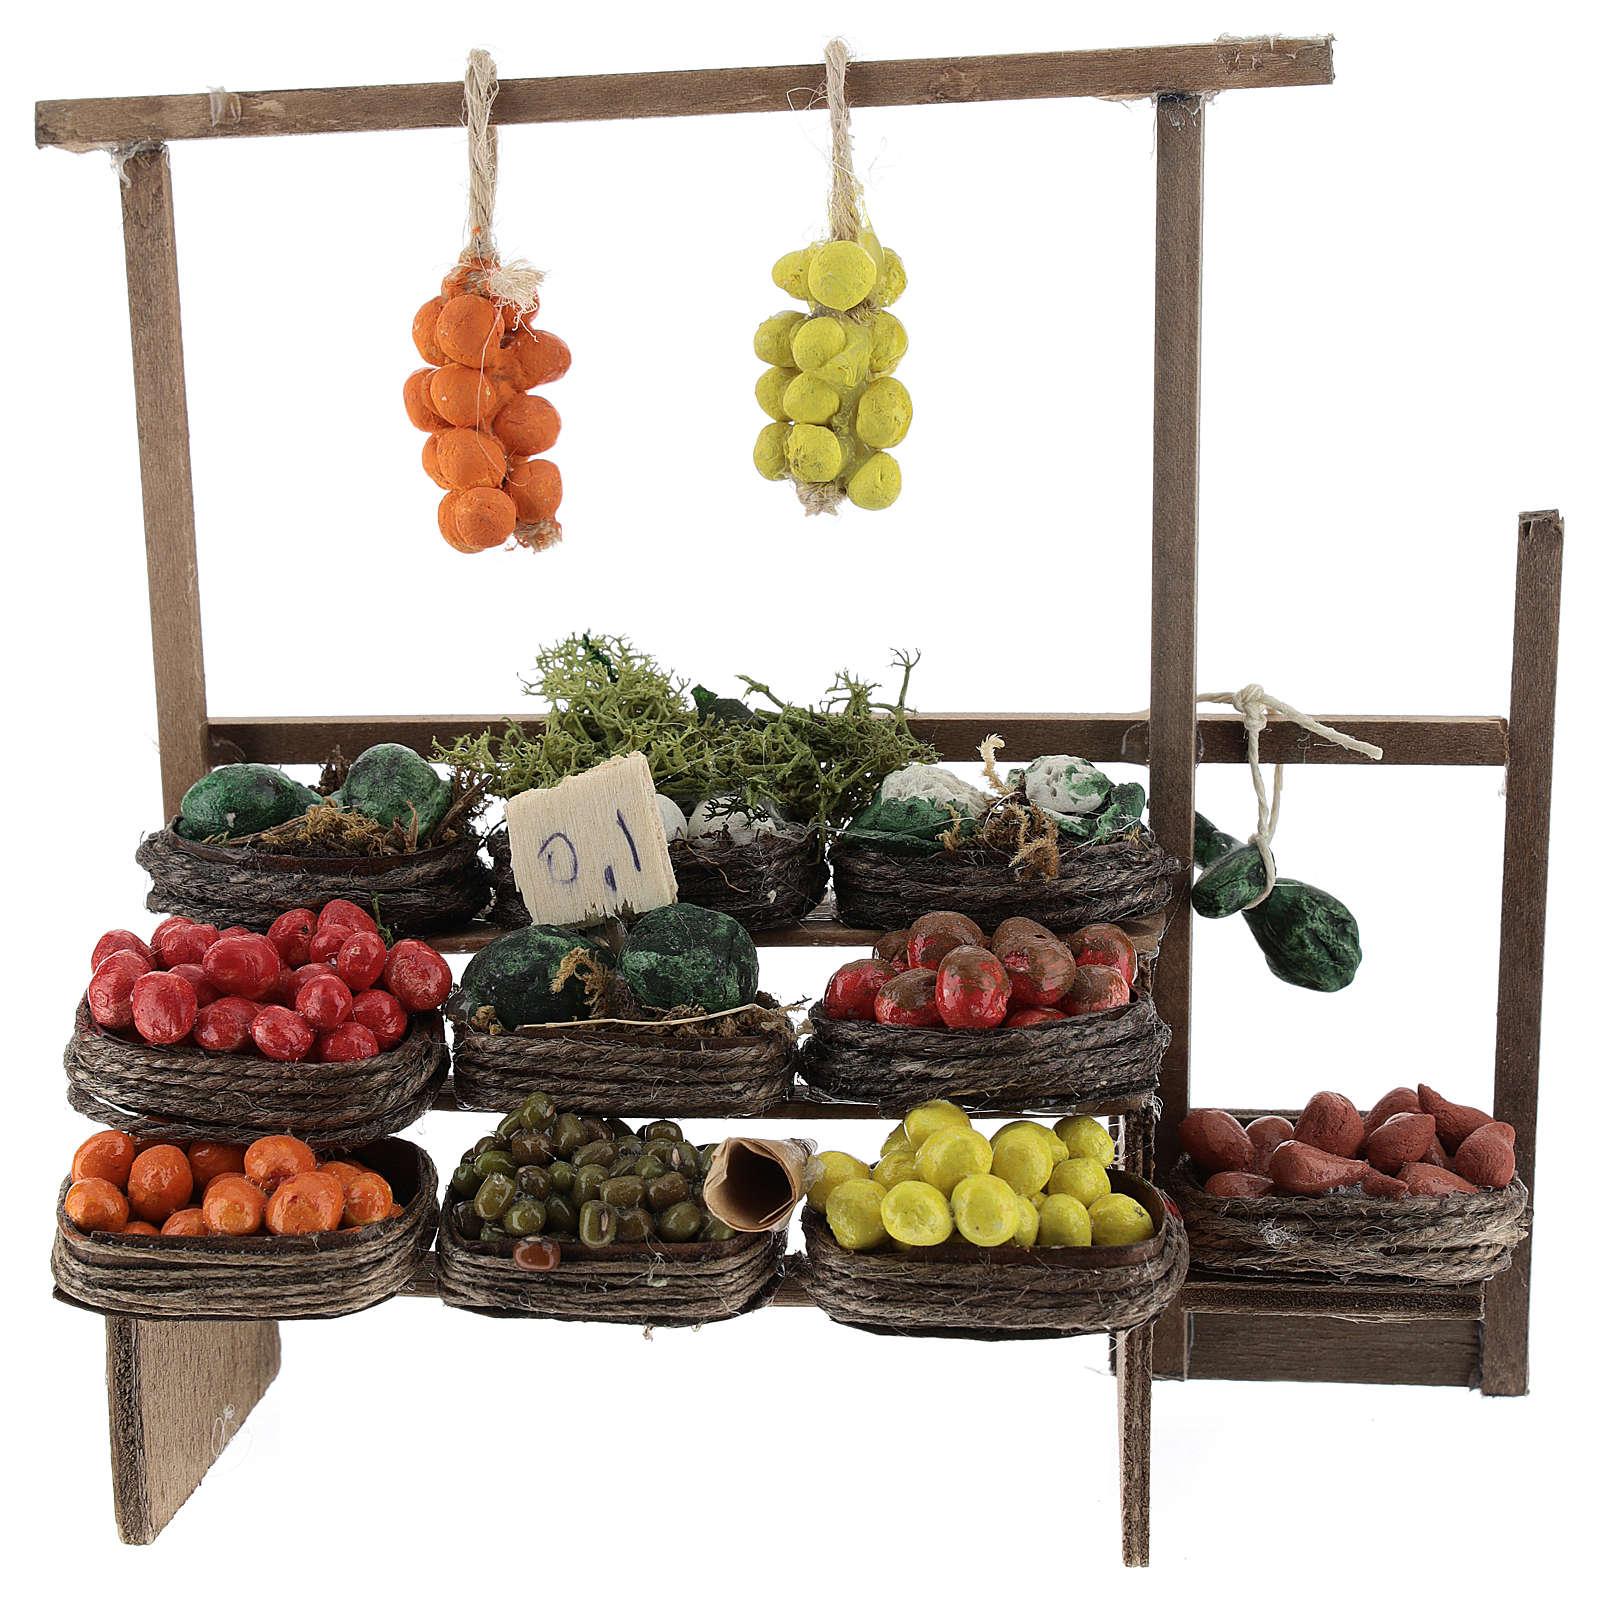 Banco frutta presepe artigianale Napoli 4